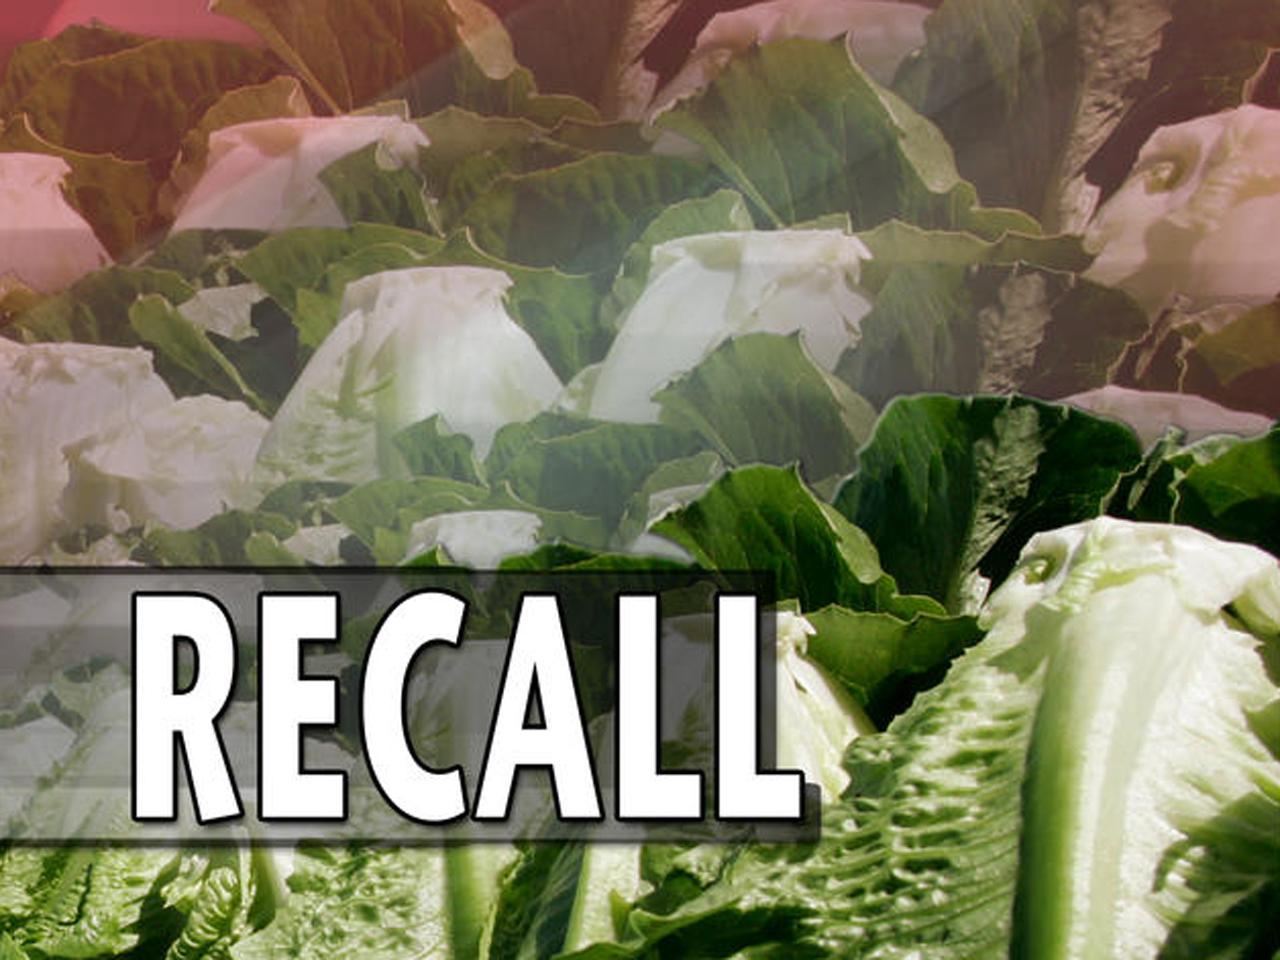 E.coli fears prompt romaine lettuce recall - CBS News